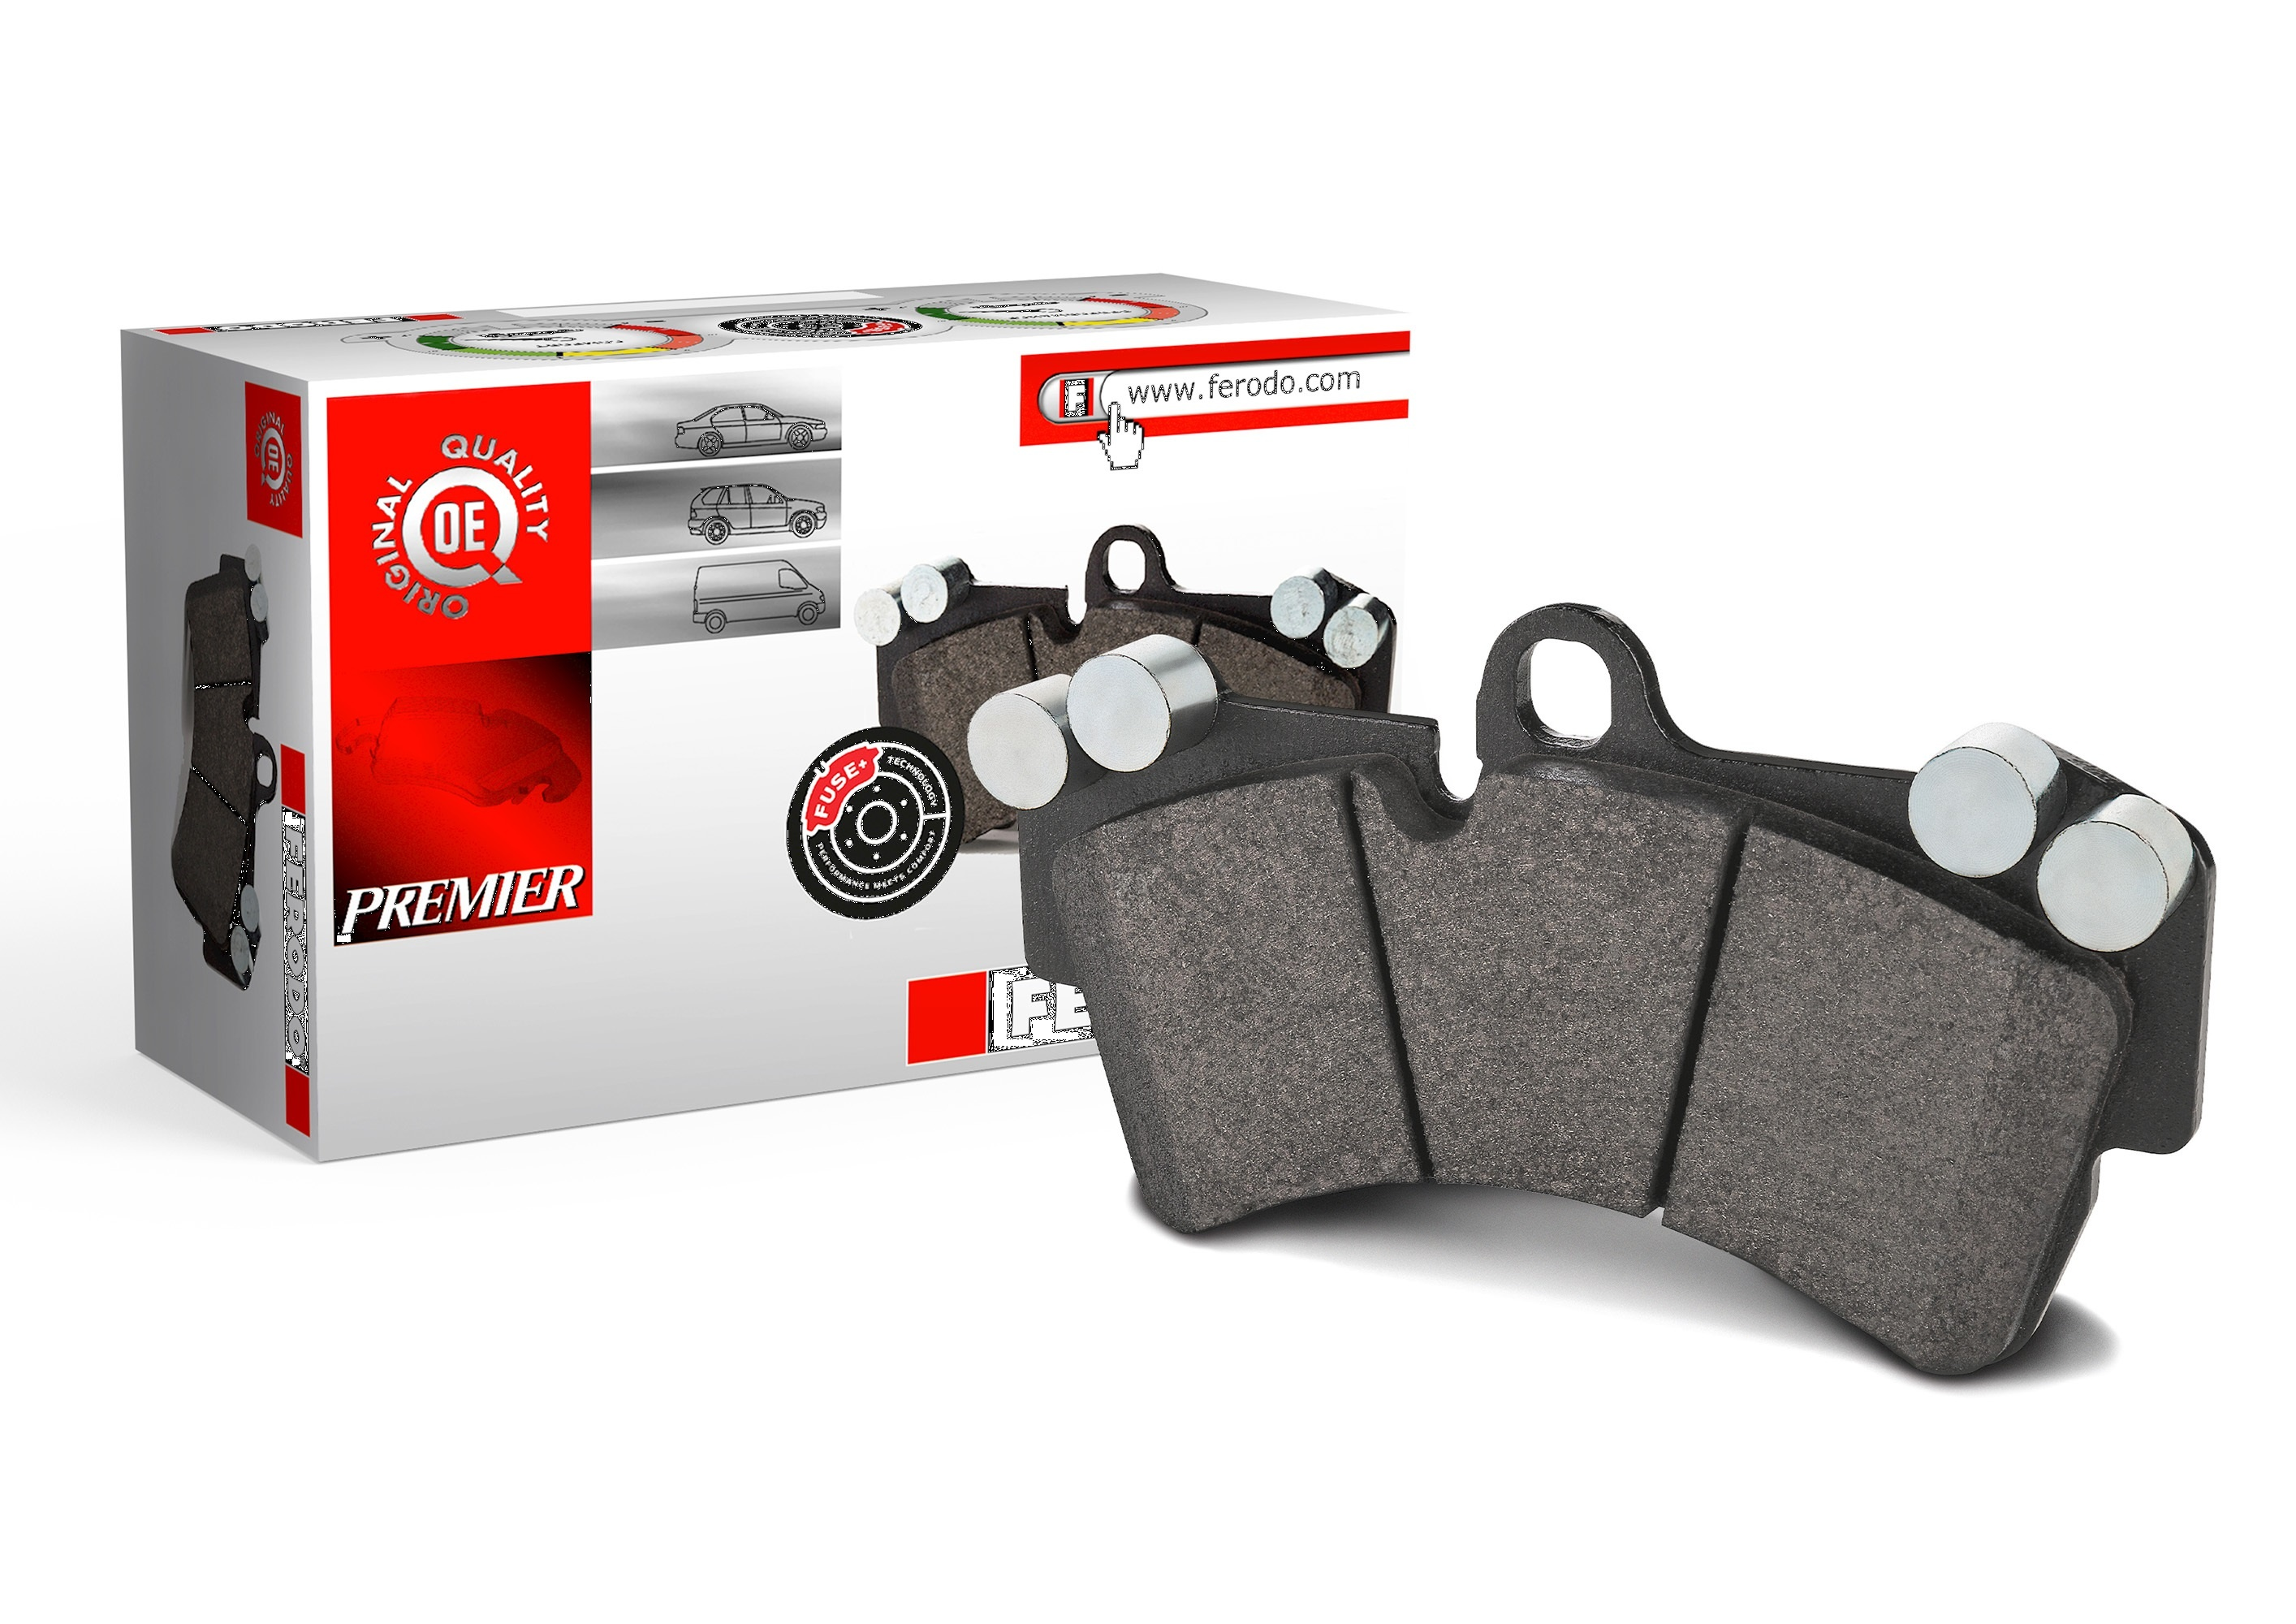 FERODO® Introduces First Automotive Brake Pads to Bridge Gap Between Braking Performance and Comfort